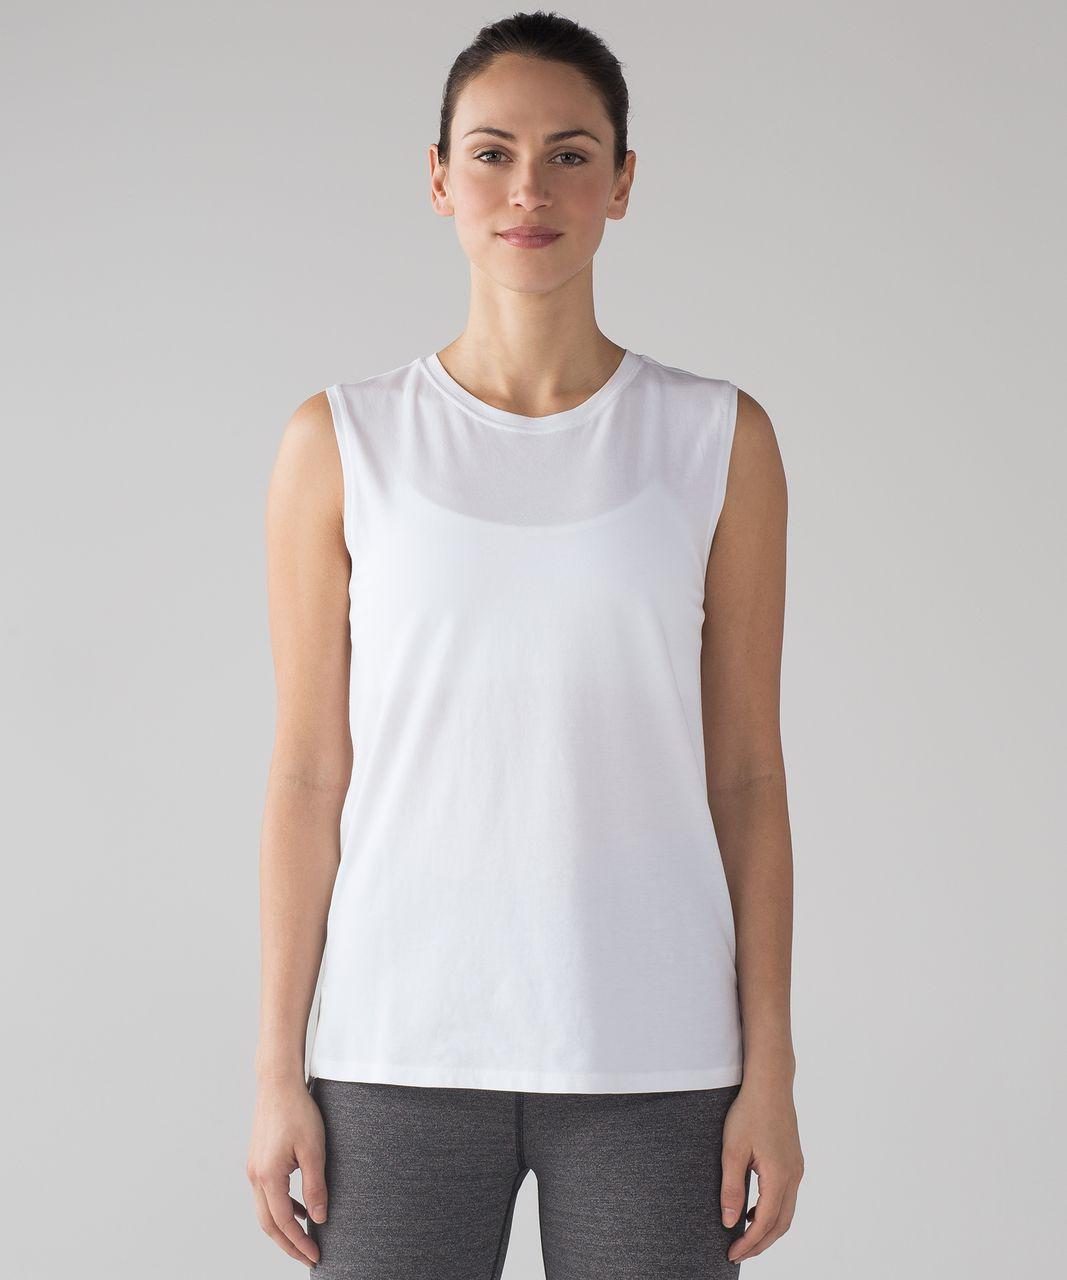 Lululemon Love Sleeveless Tank - White